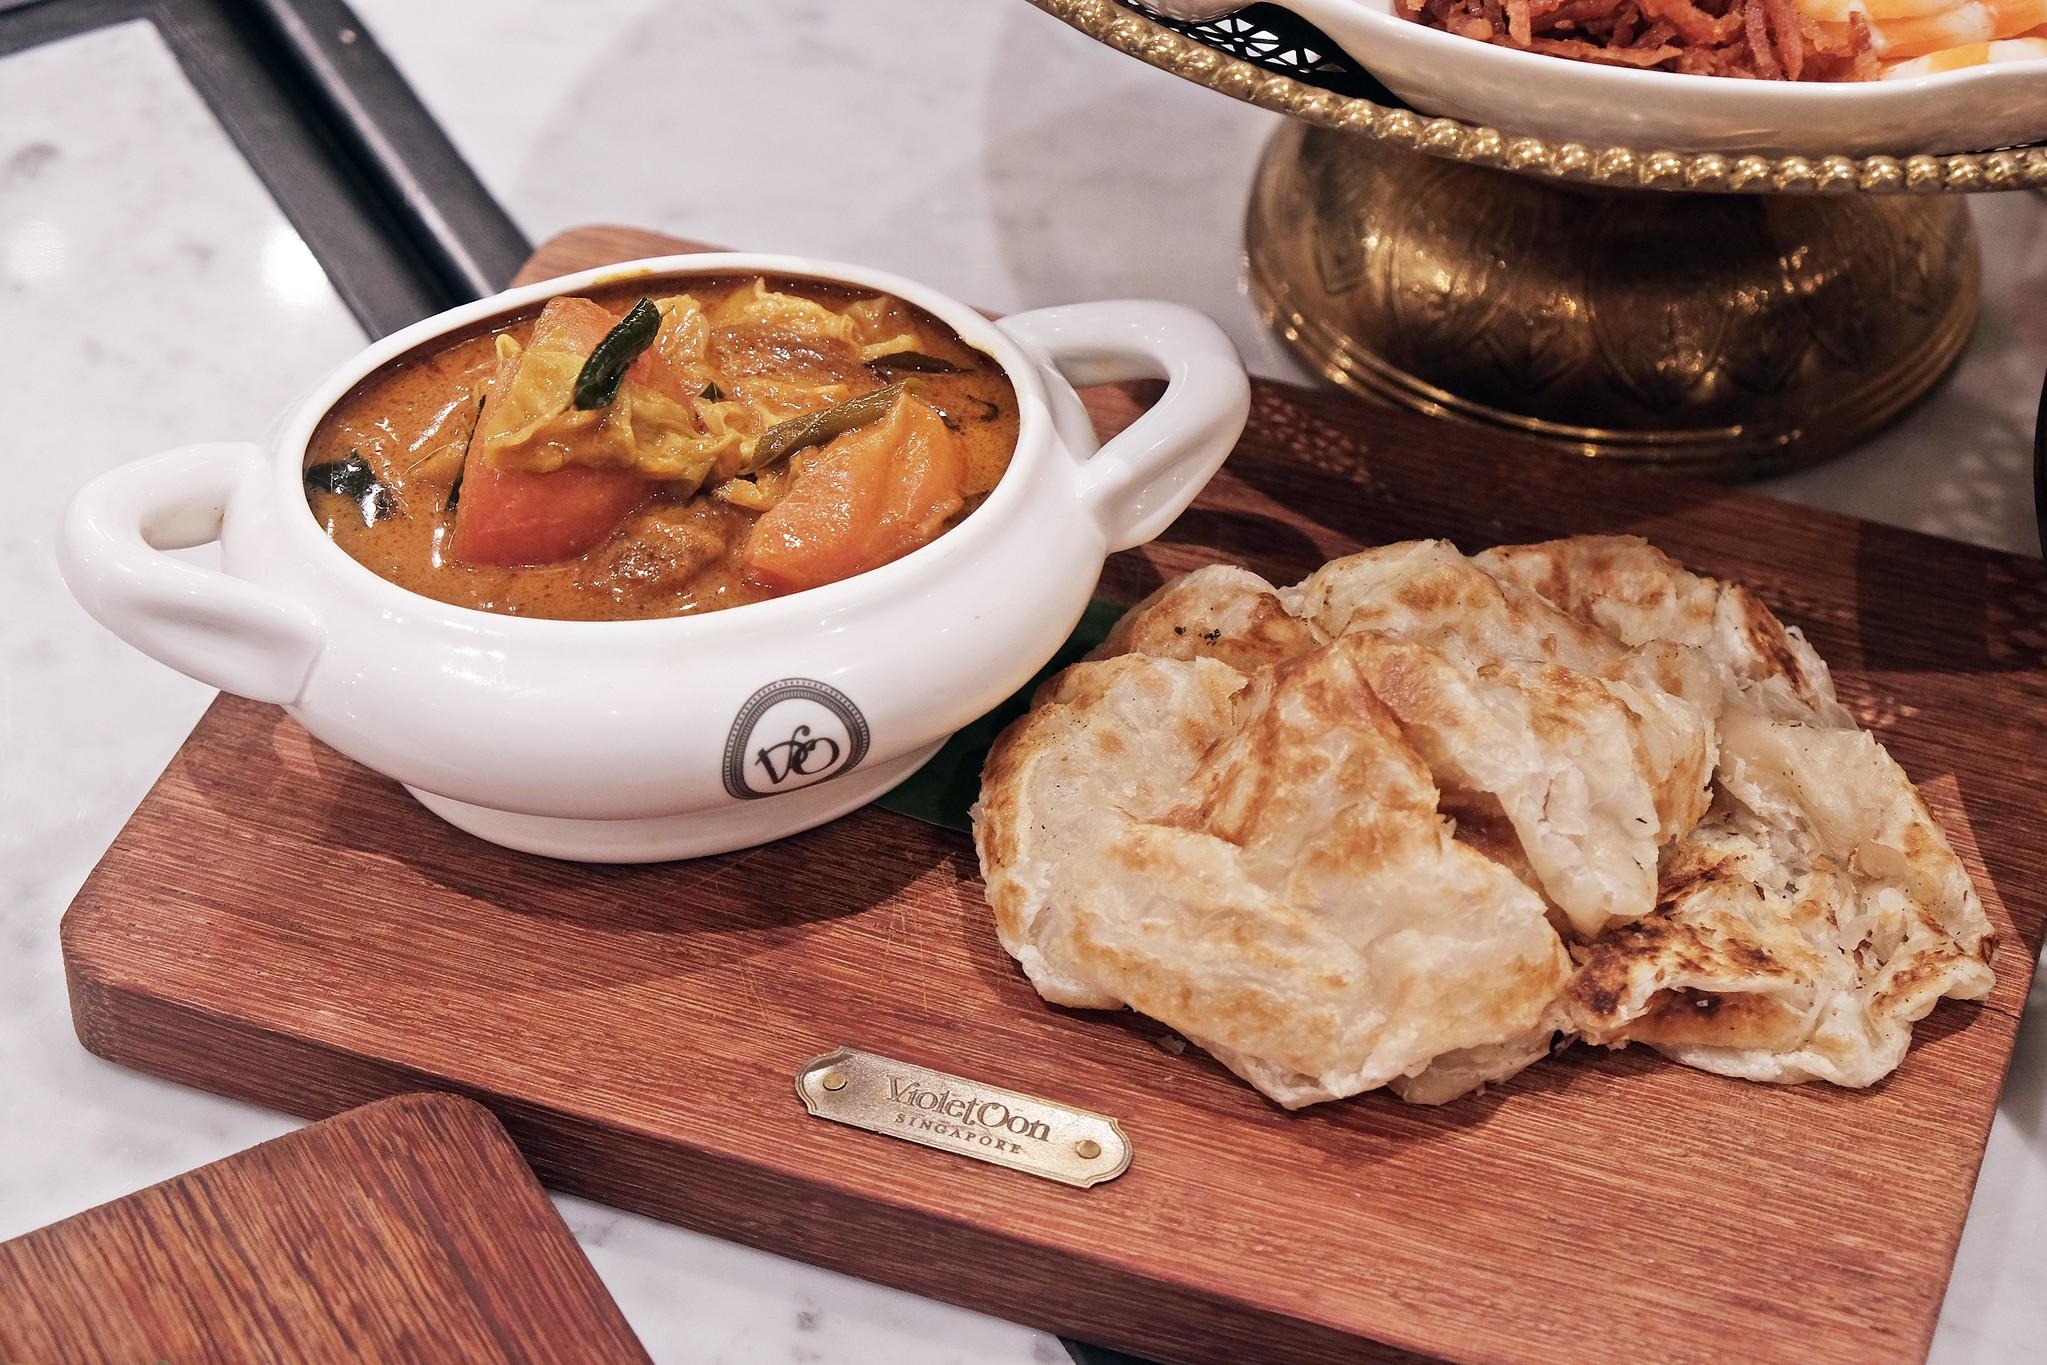 Violet Onn Jewel Changi Airport-Roti Prata vegetarian